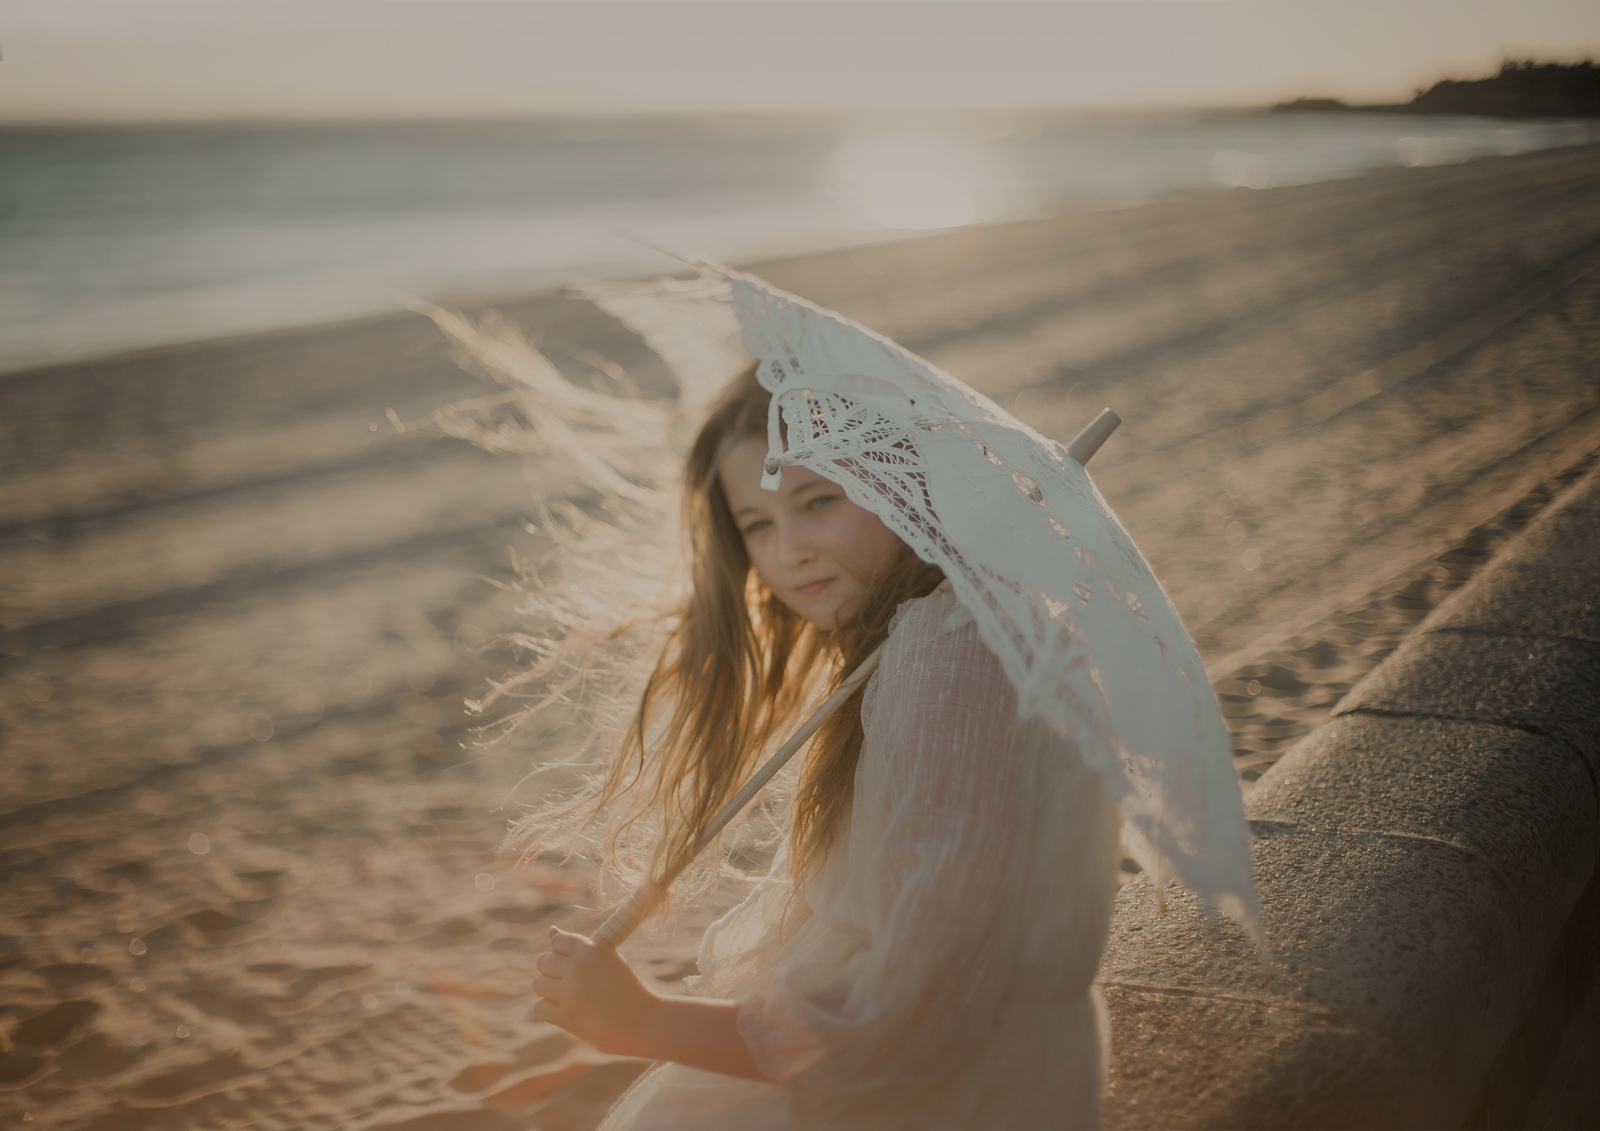 Freelensed photo of Tween girl